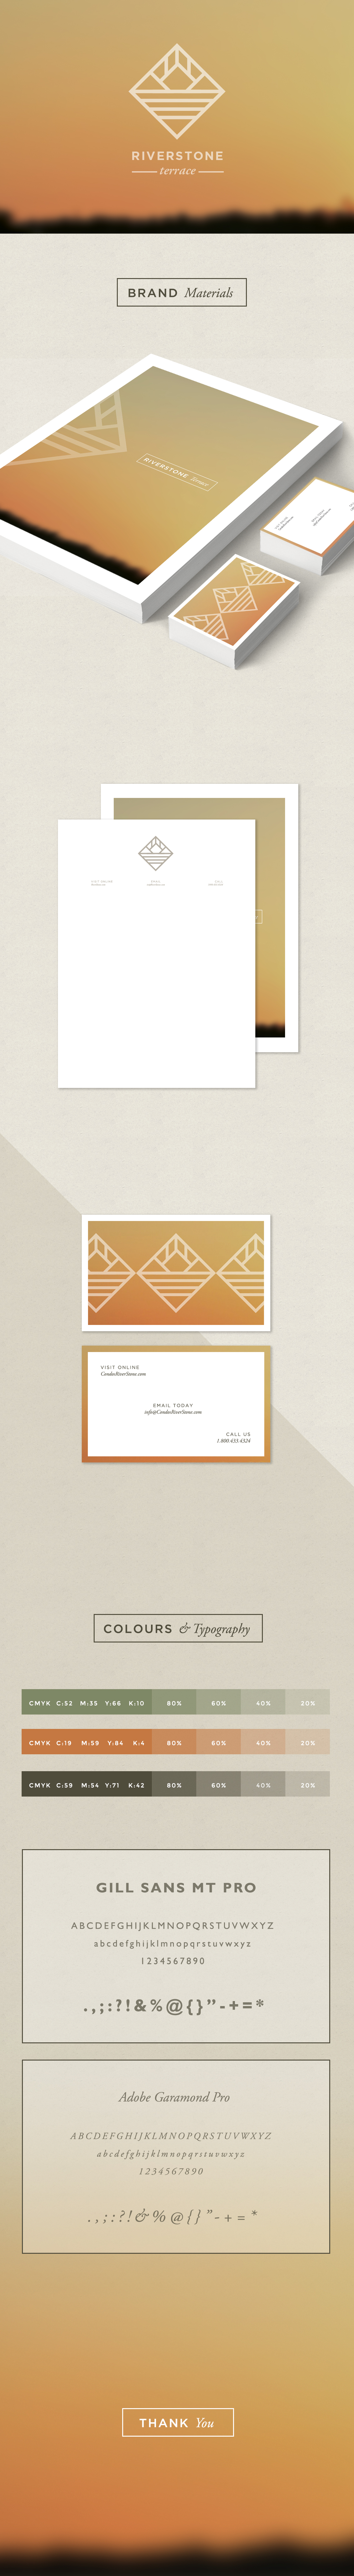 winnipeg-branding_0.jpg